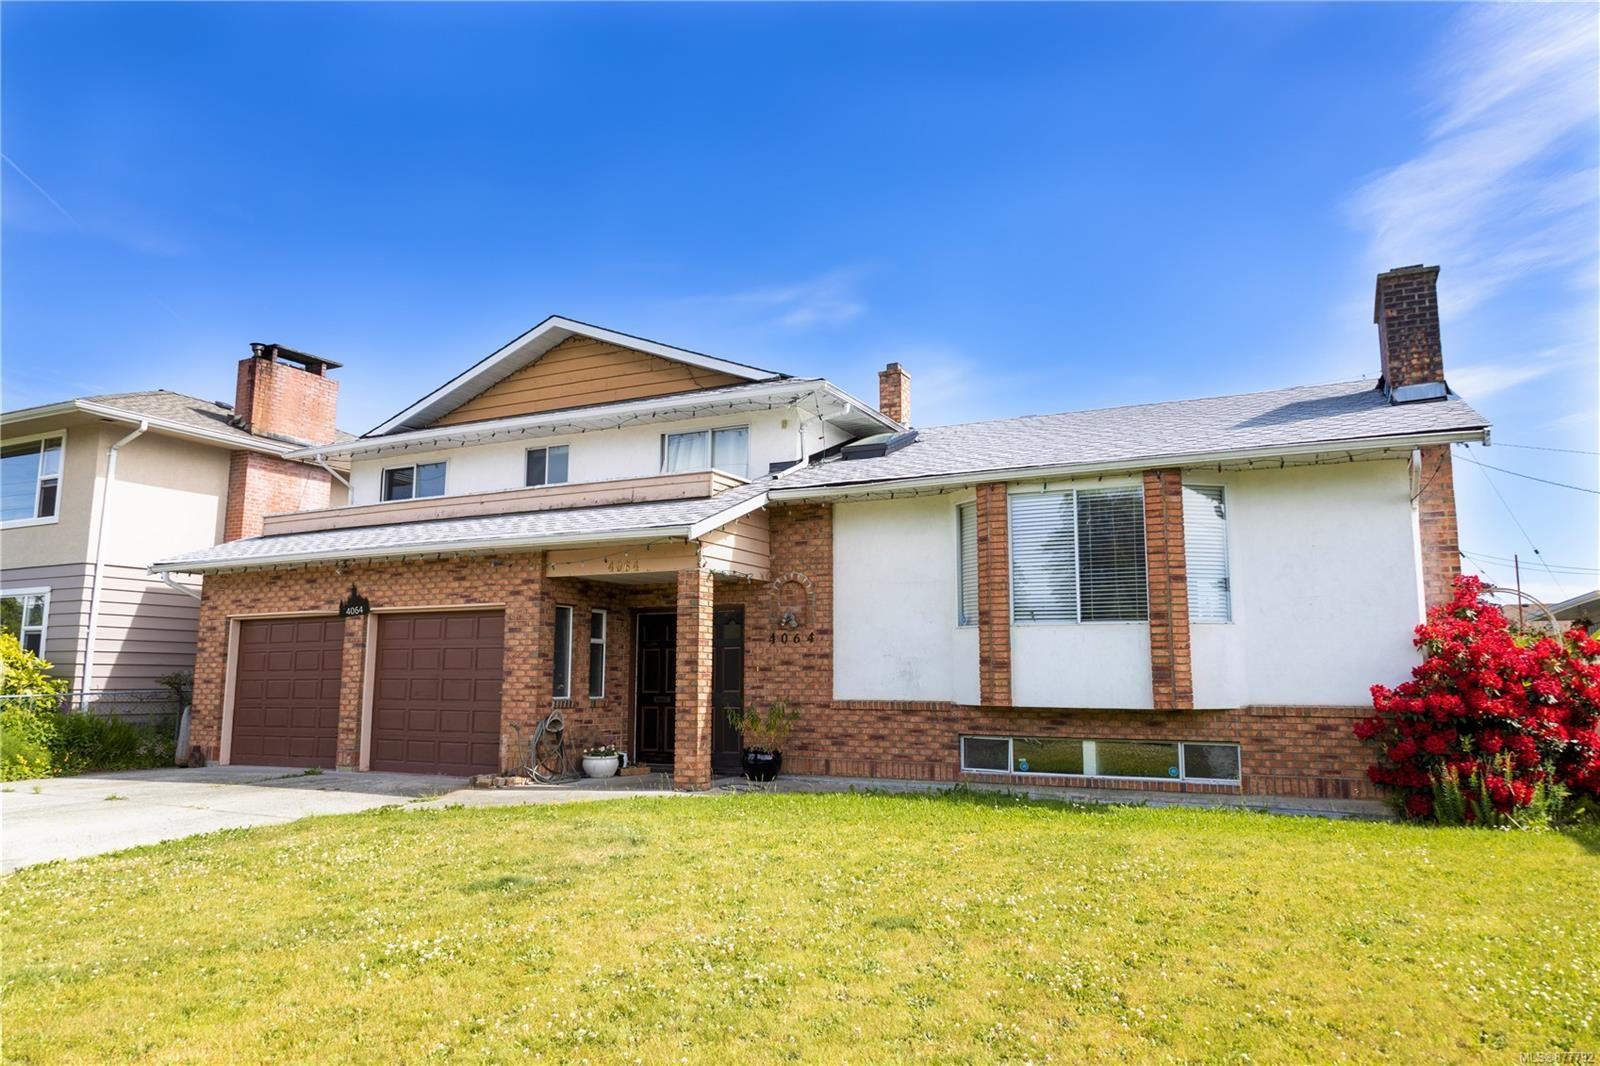 Main Photo: 4064 Wallace St in : PA Port Alberni House for sale (Port Alberni)  : MLS®# 877792